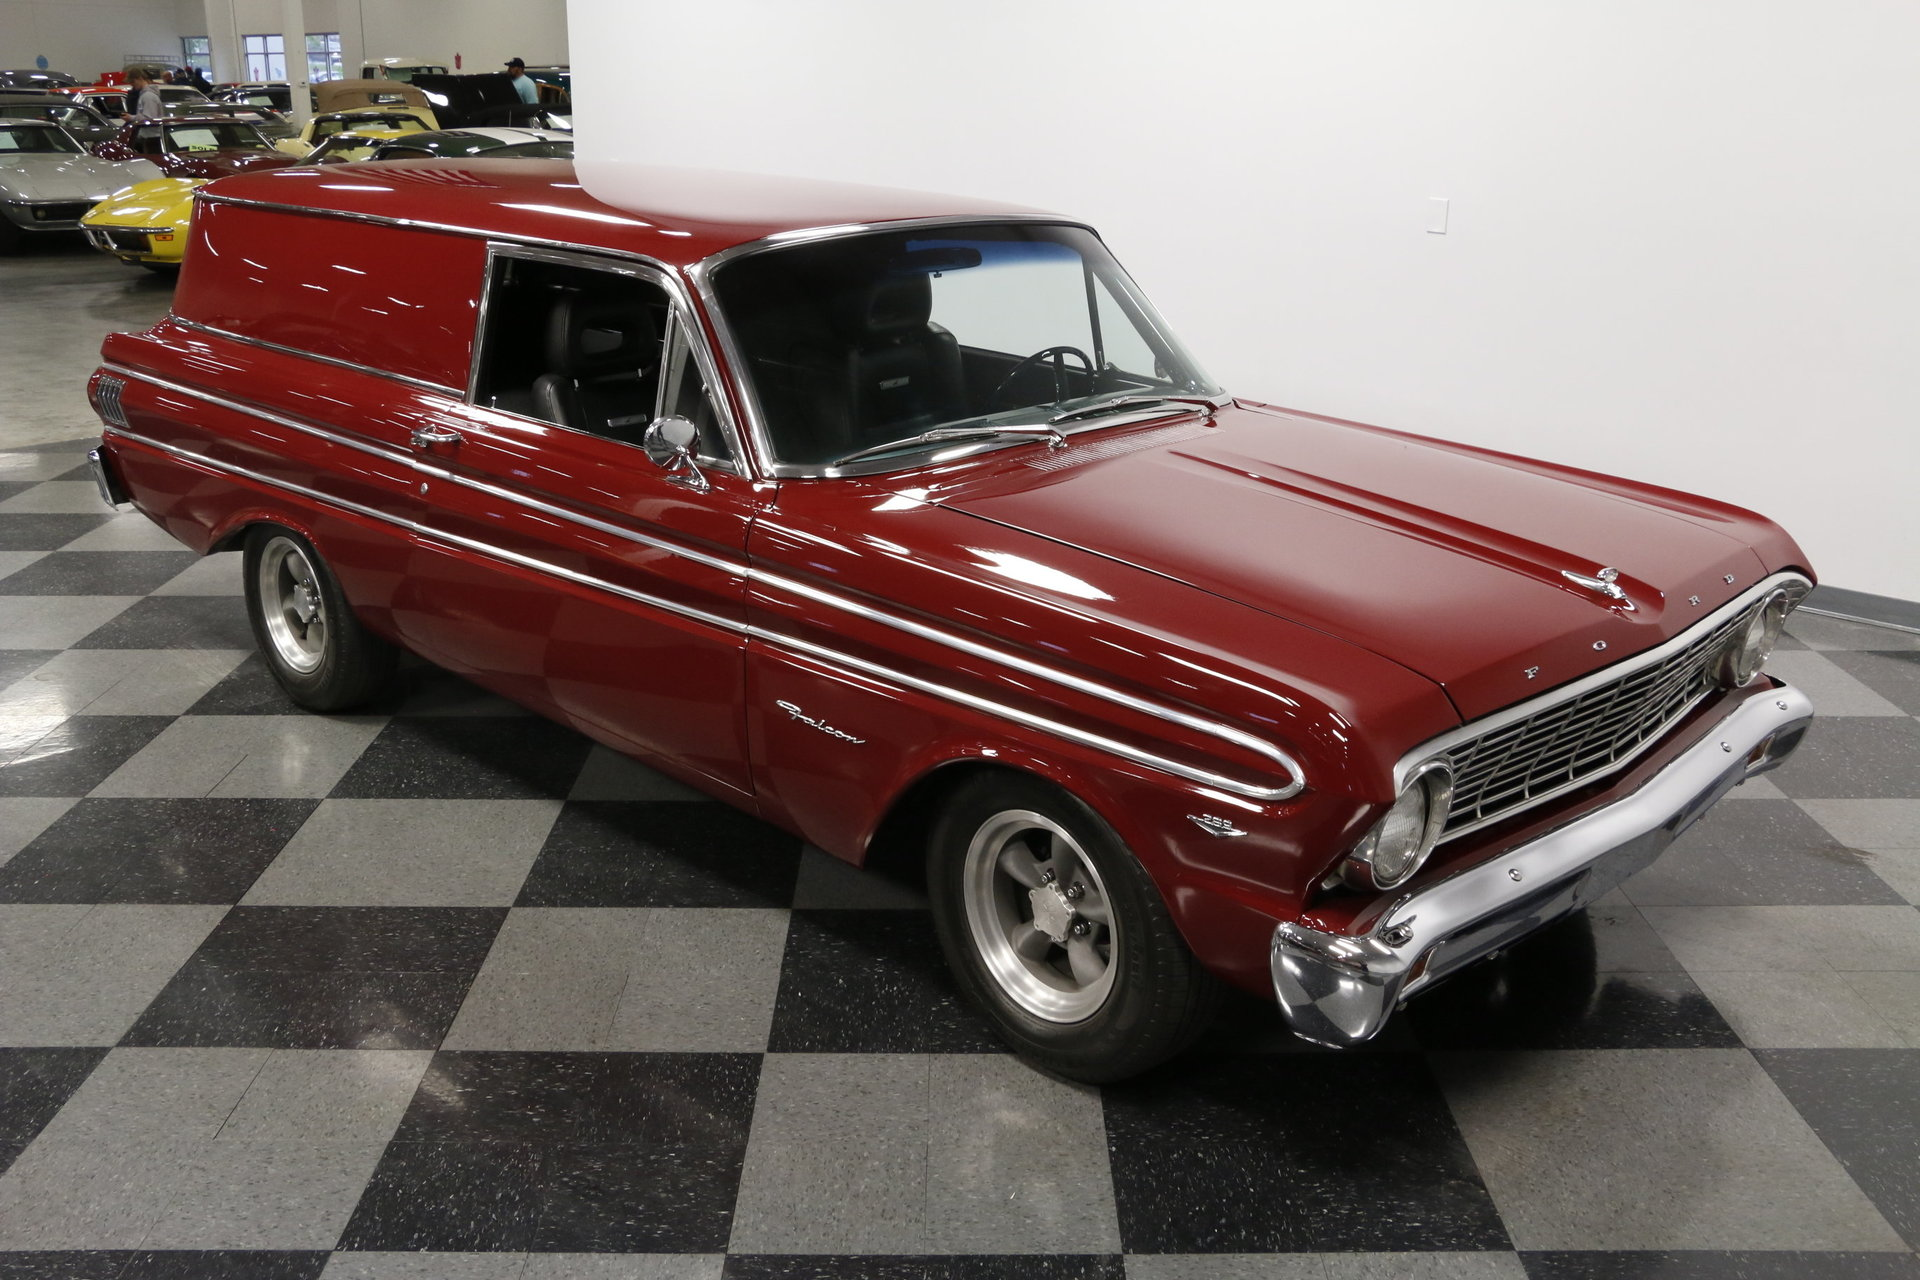 1964 ford falcon sedan delivery for sale 85780 mcg. Black Bedroom Furniture Sets. Home Design Ideas